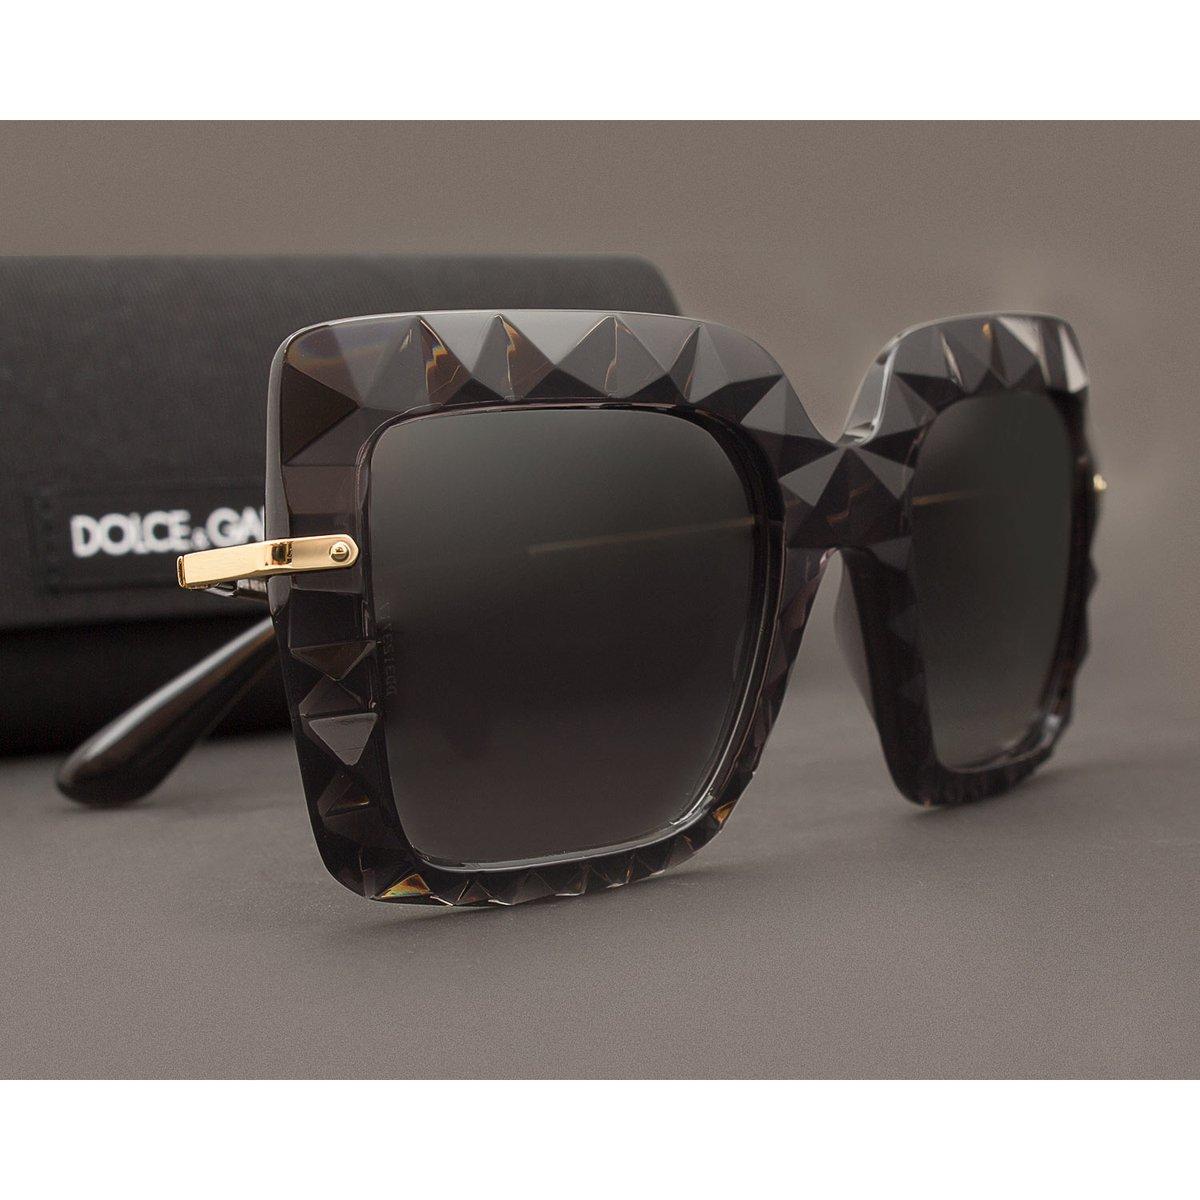 ace8e4c5e Óculos de Sol Dolce e Gabbana DG6111 504/8G-51 | Zattini